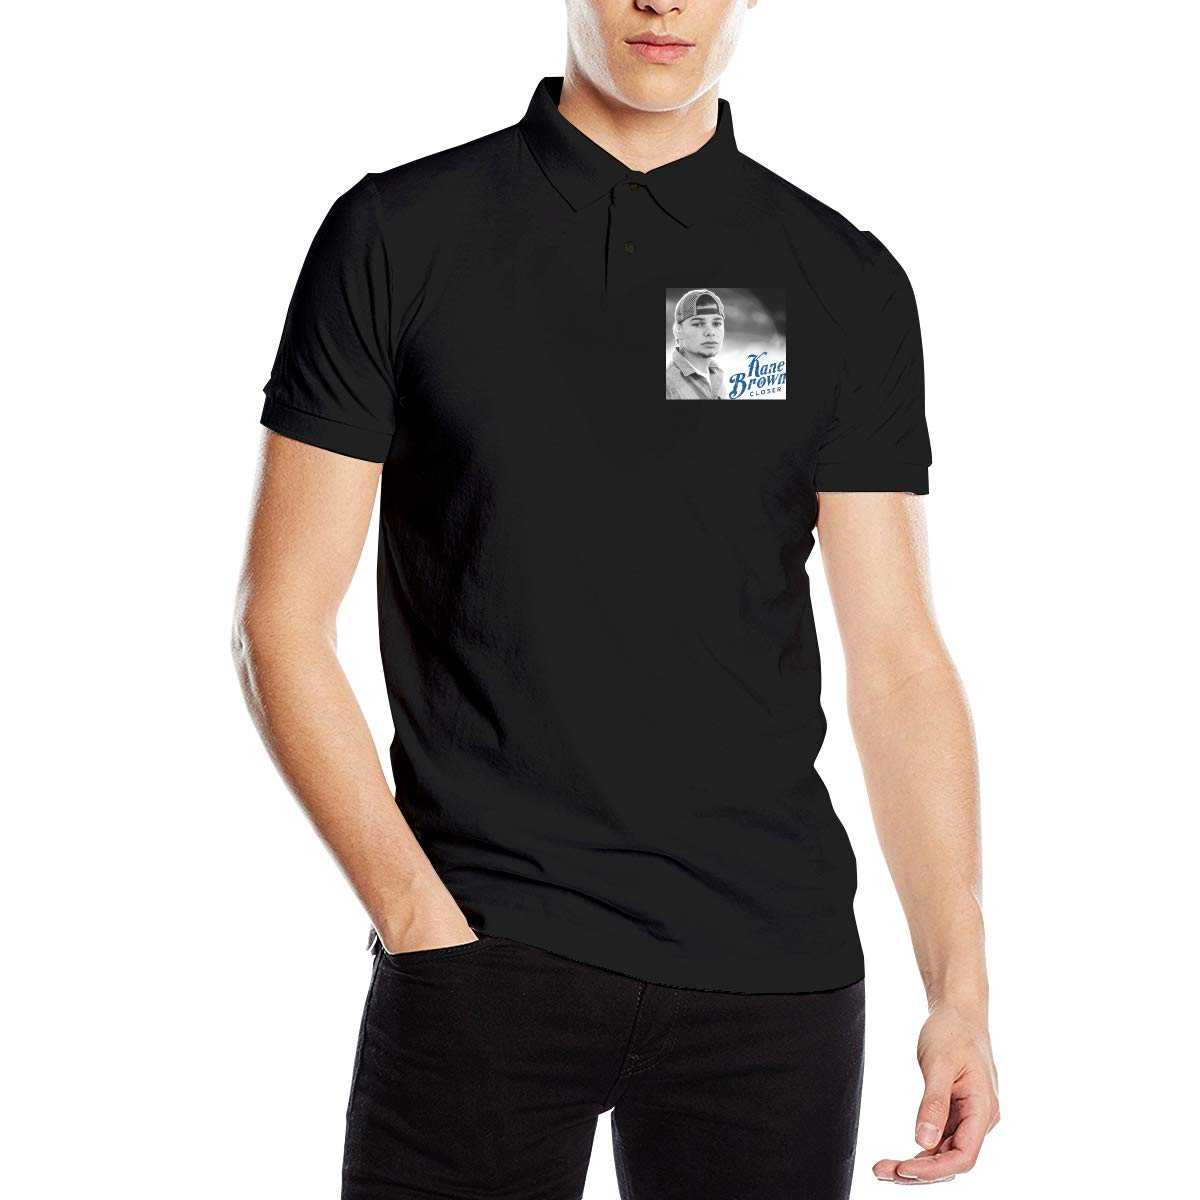 Cjlrqone Listen Free to Kane Brown Men Leisure Polo Shirts XXL Black